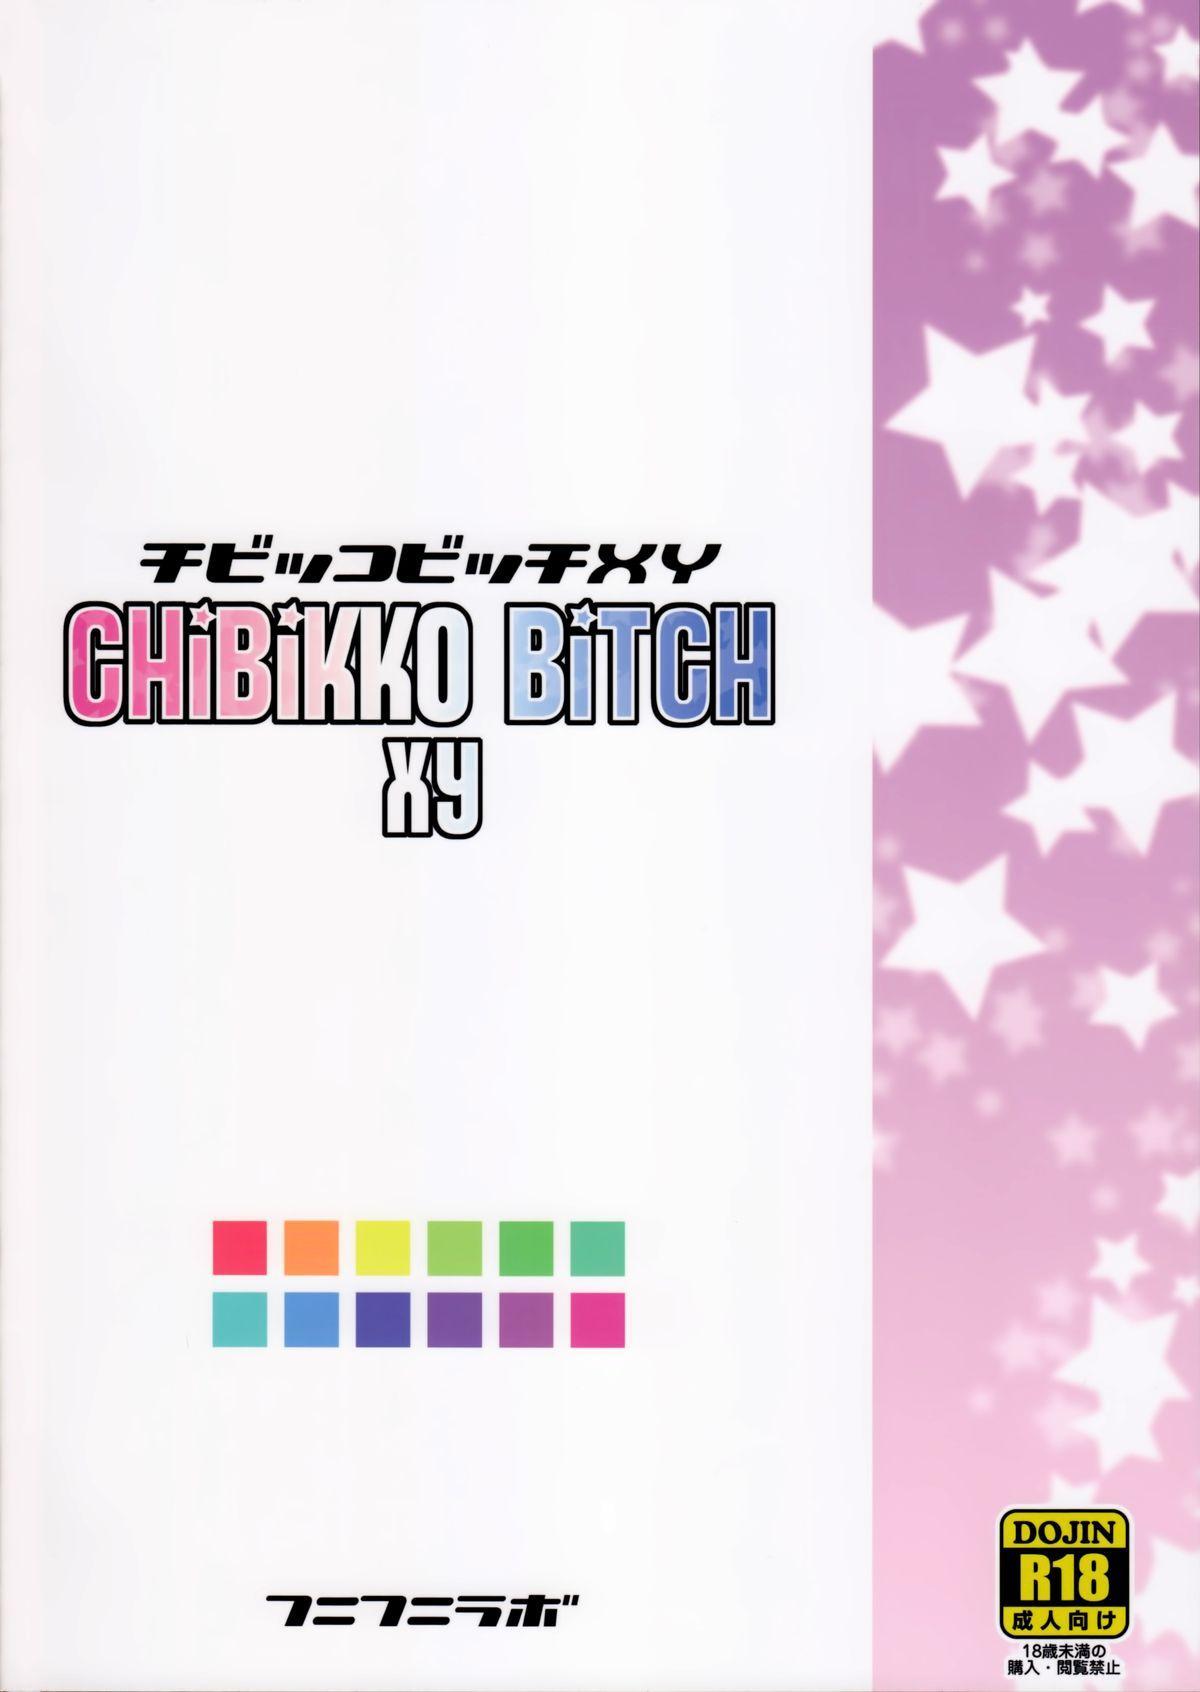 Chibikko Bitch XY 33